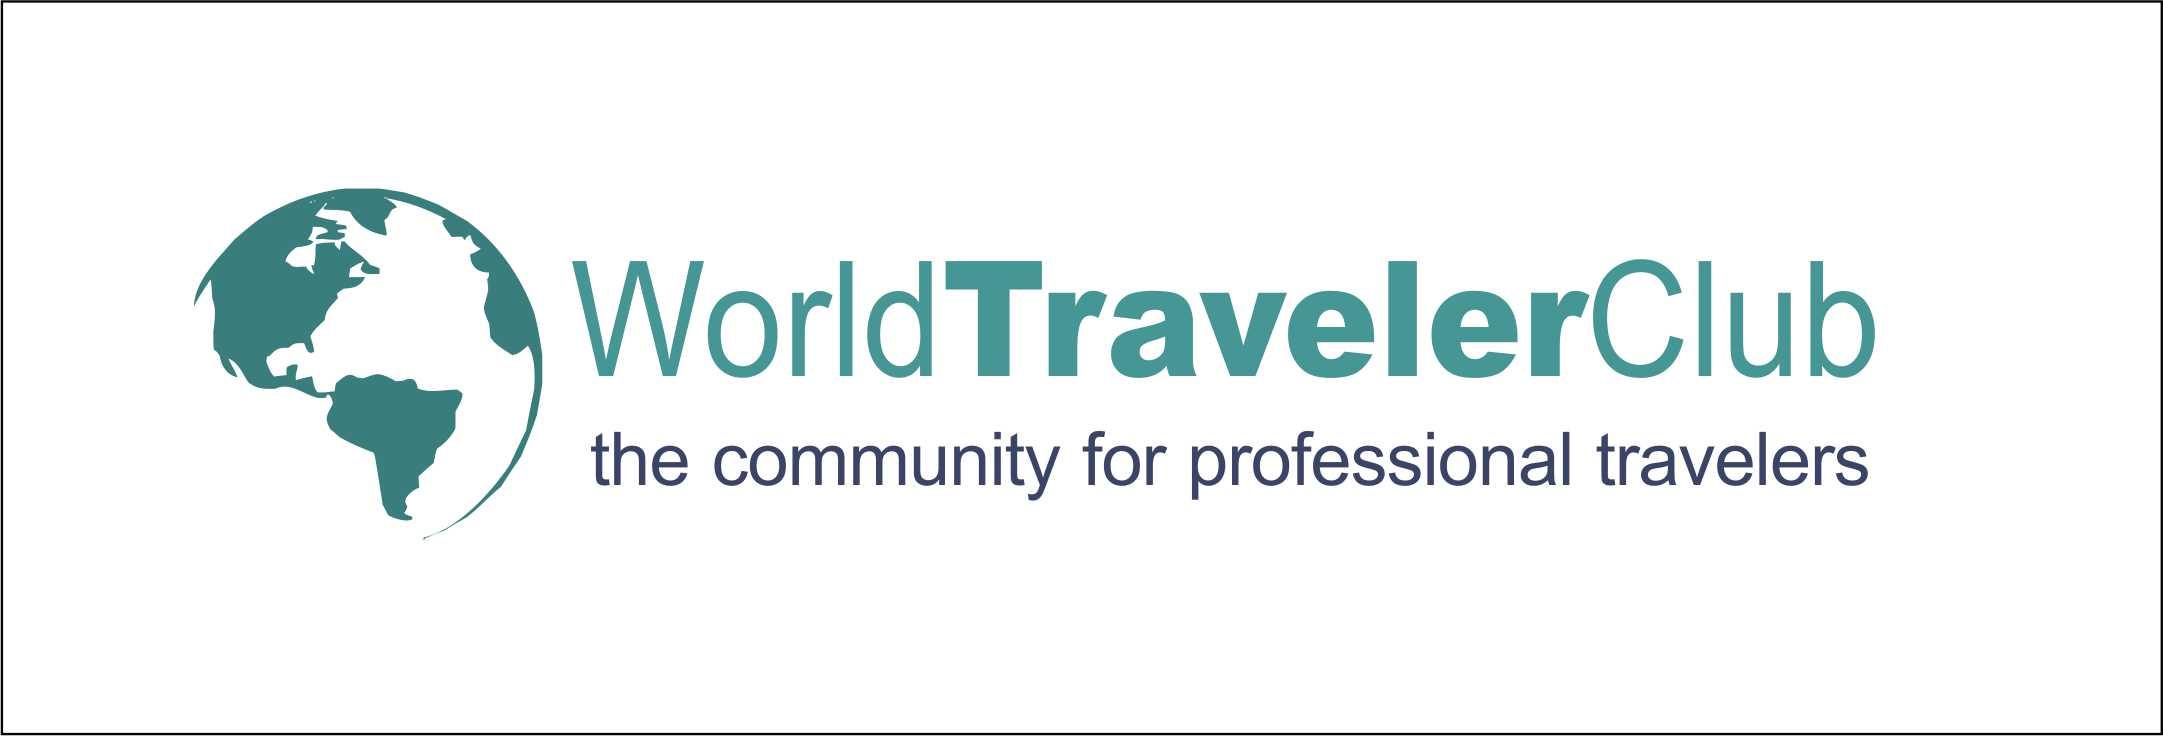 World Traveler Club - the Travel Community